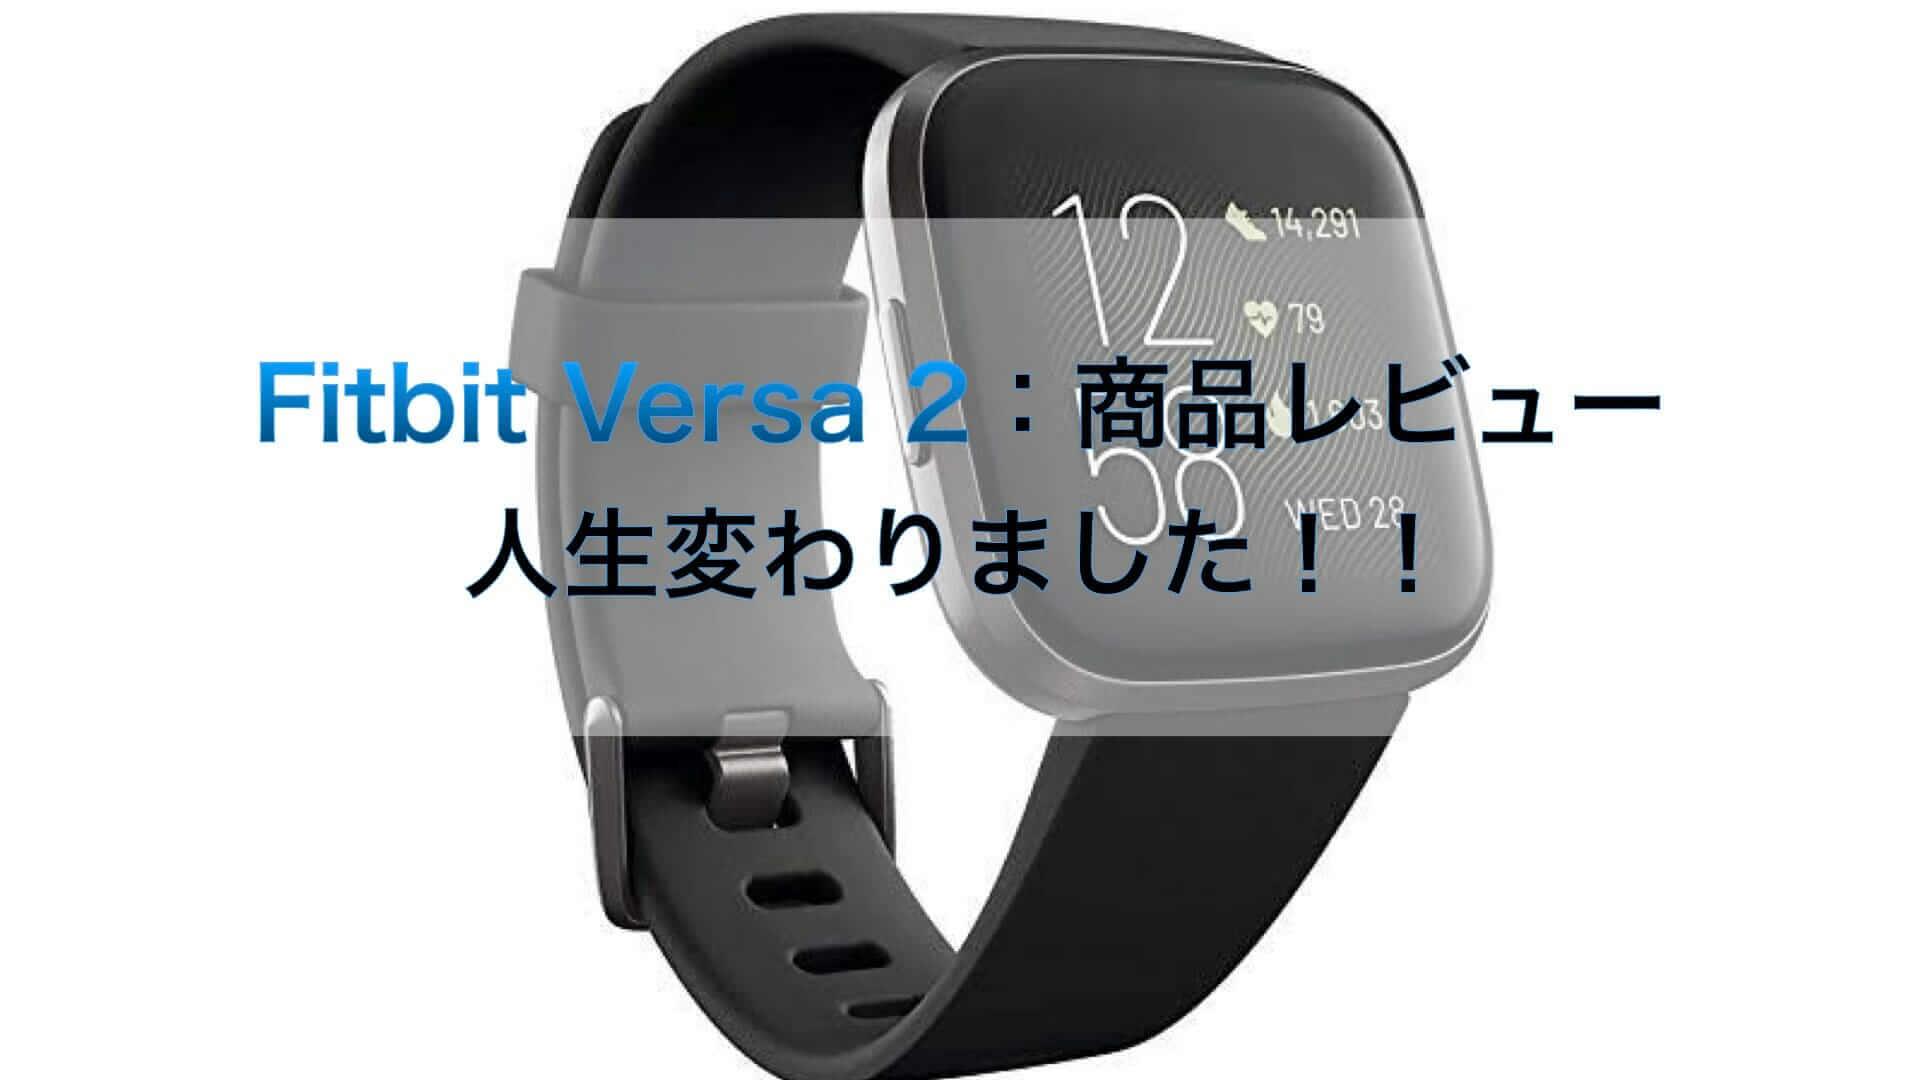 Fitbit Versa 2の商品レビュー:生活習慣を劇的に変えた魔法のガジェット